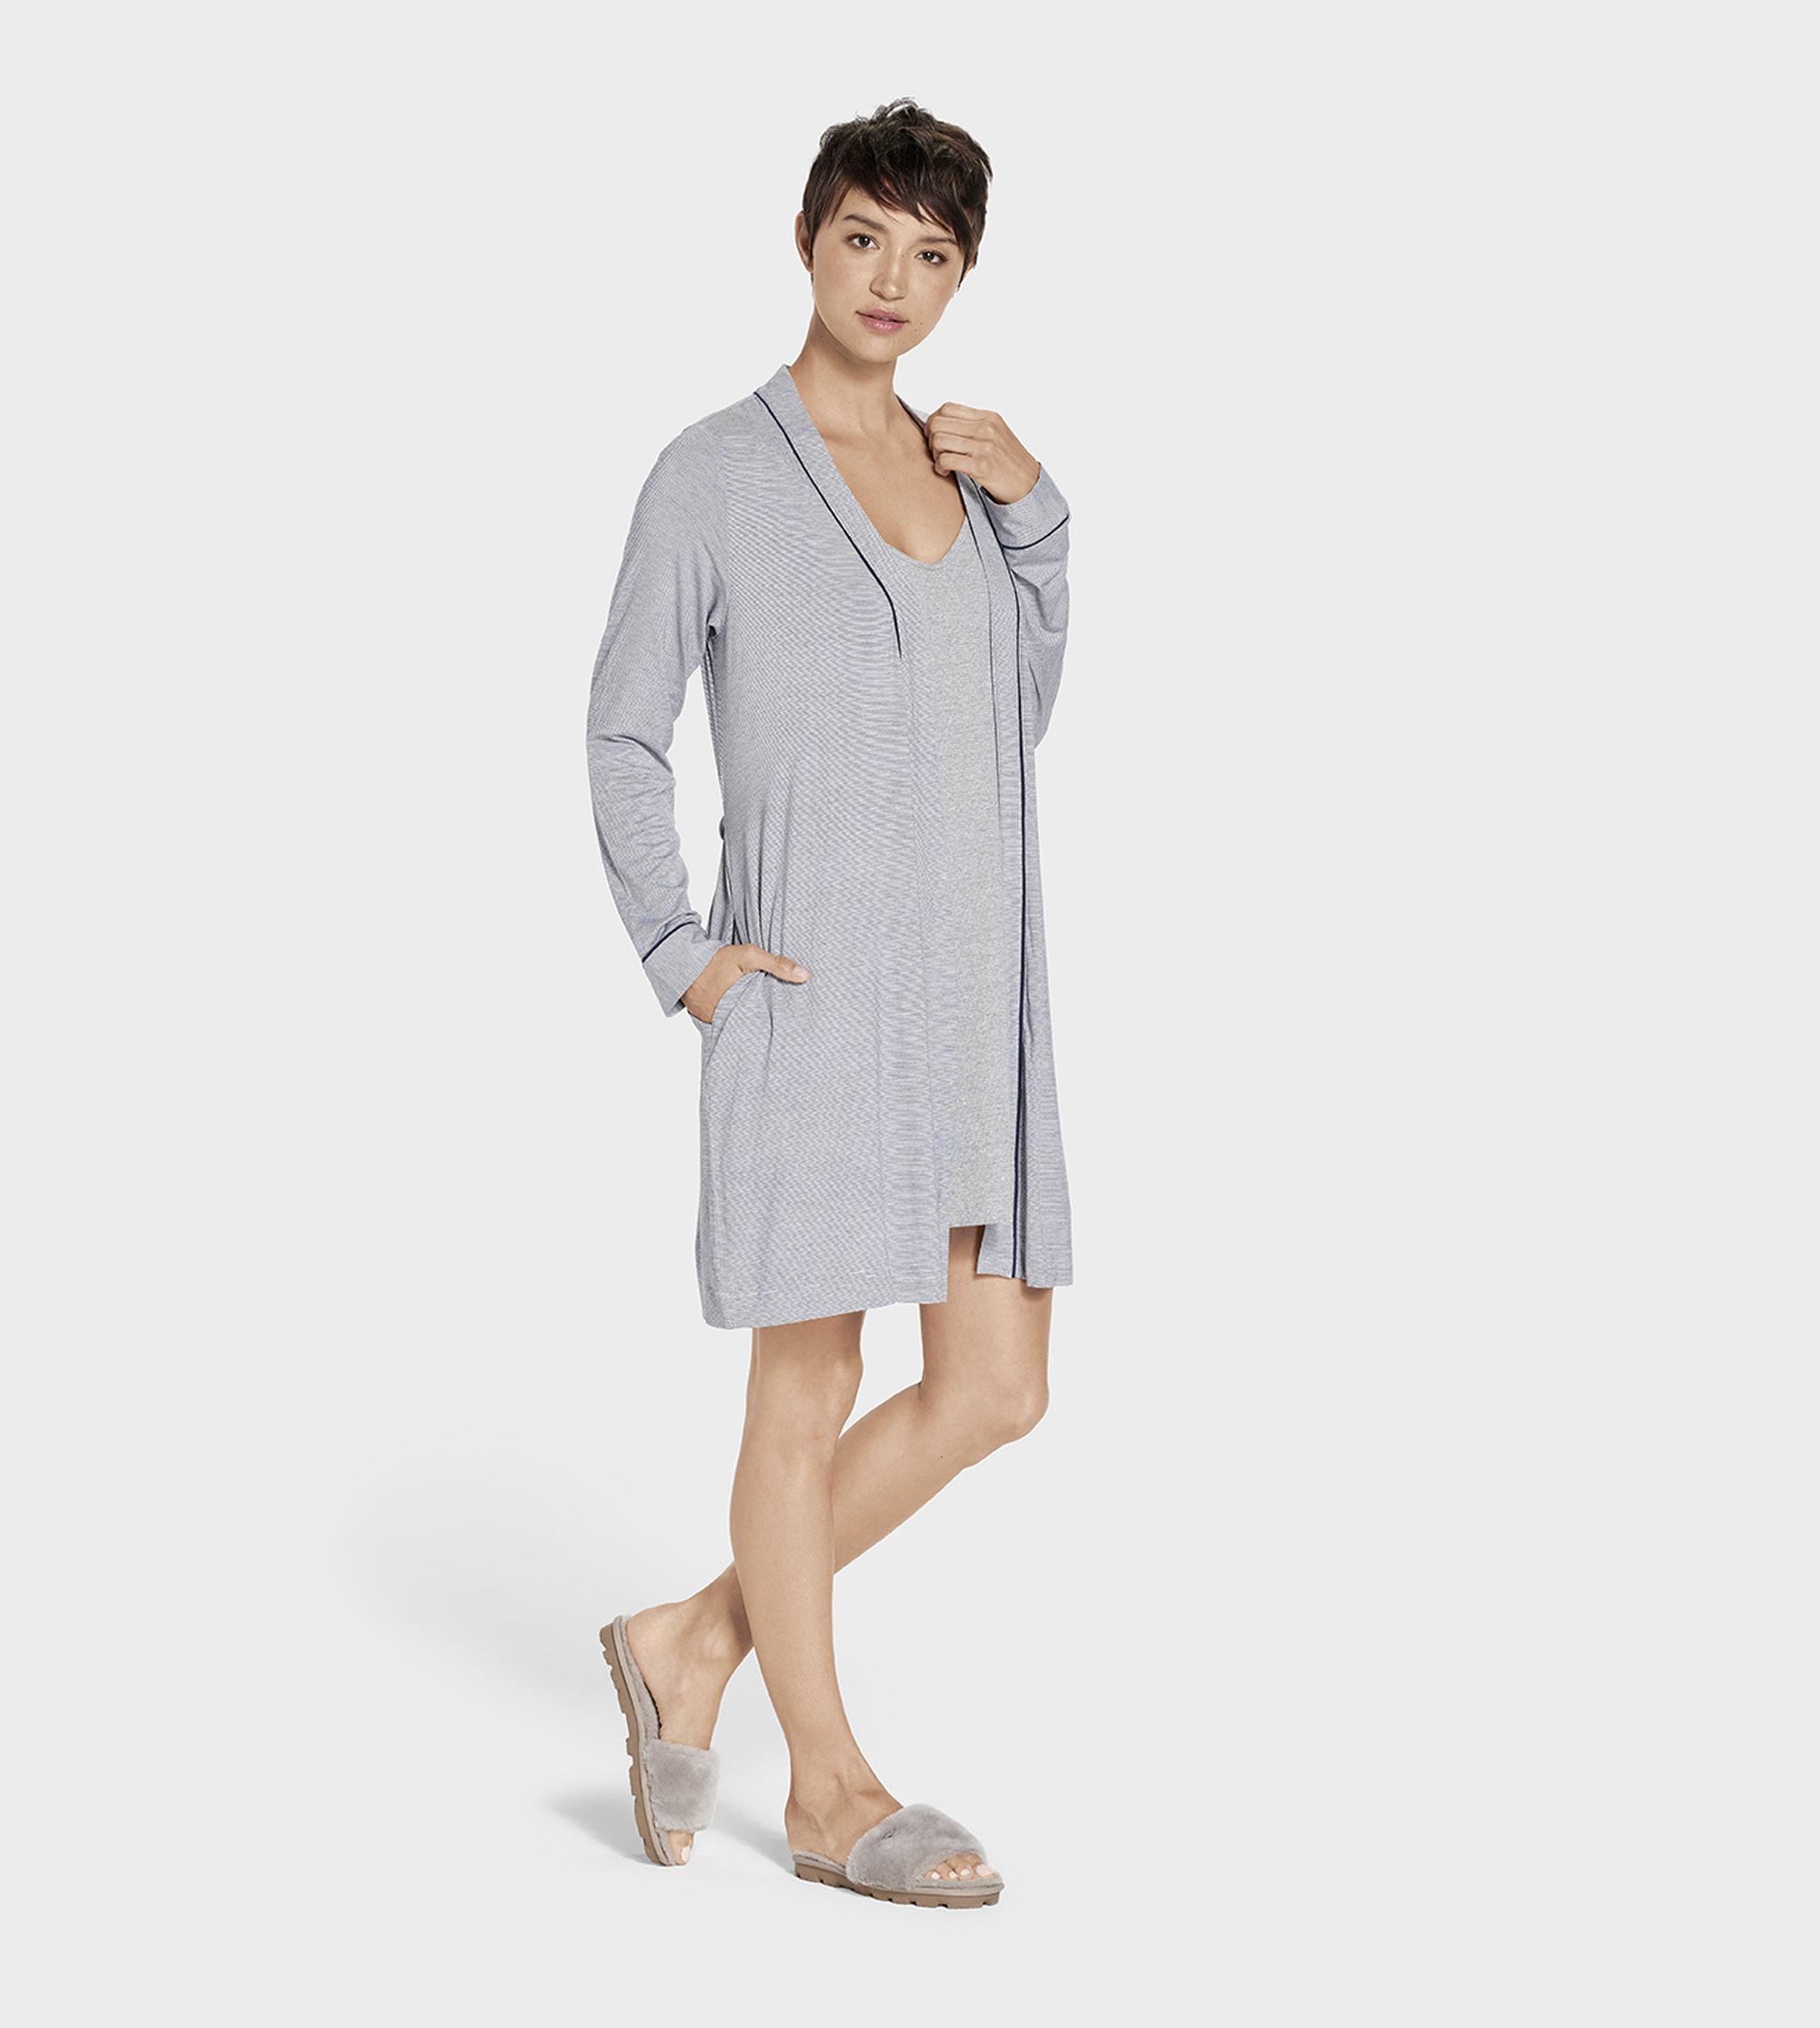 b3648055c8 Ugg - Blue Women s Aldridge Mini Stripe Dressing Gown - Lyst. View  fullscreen